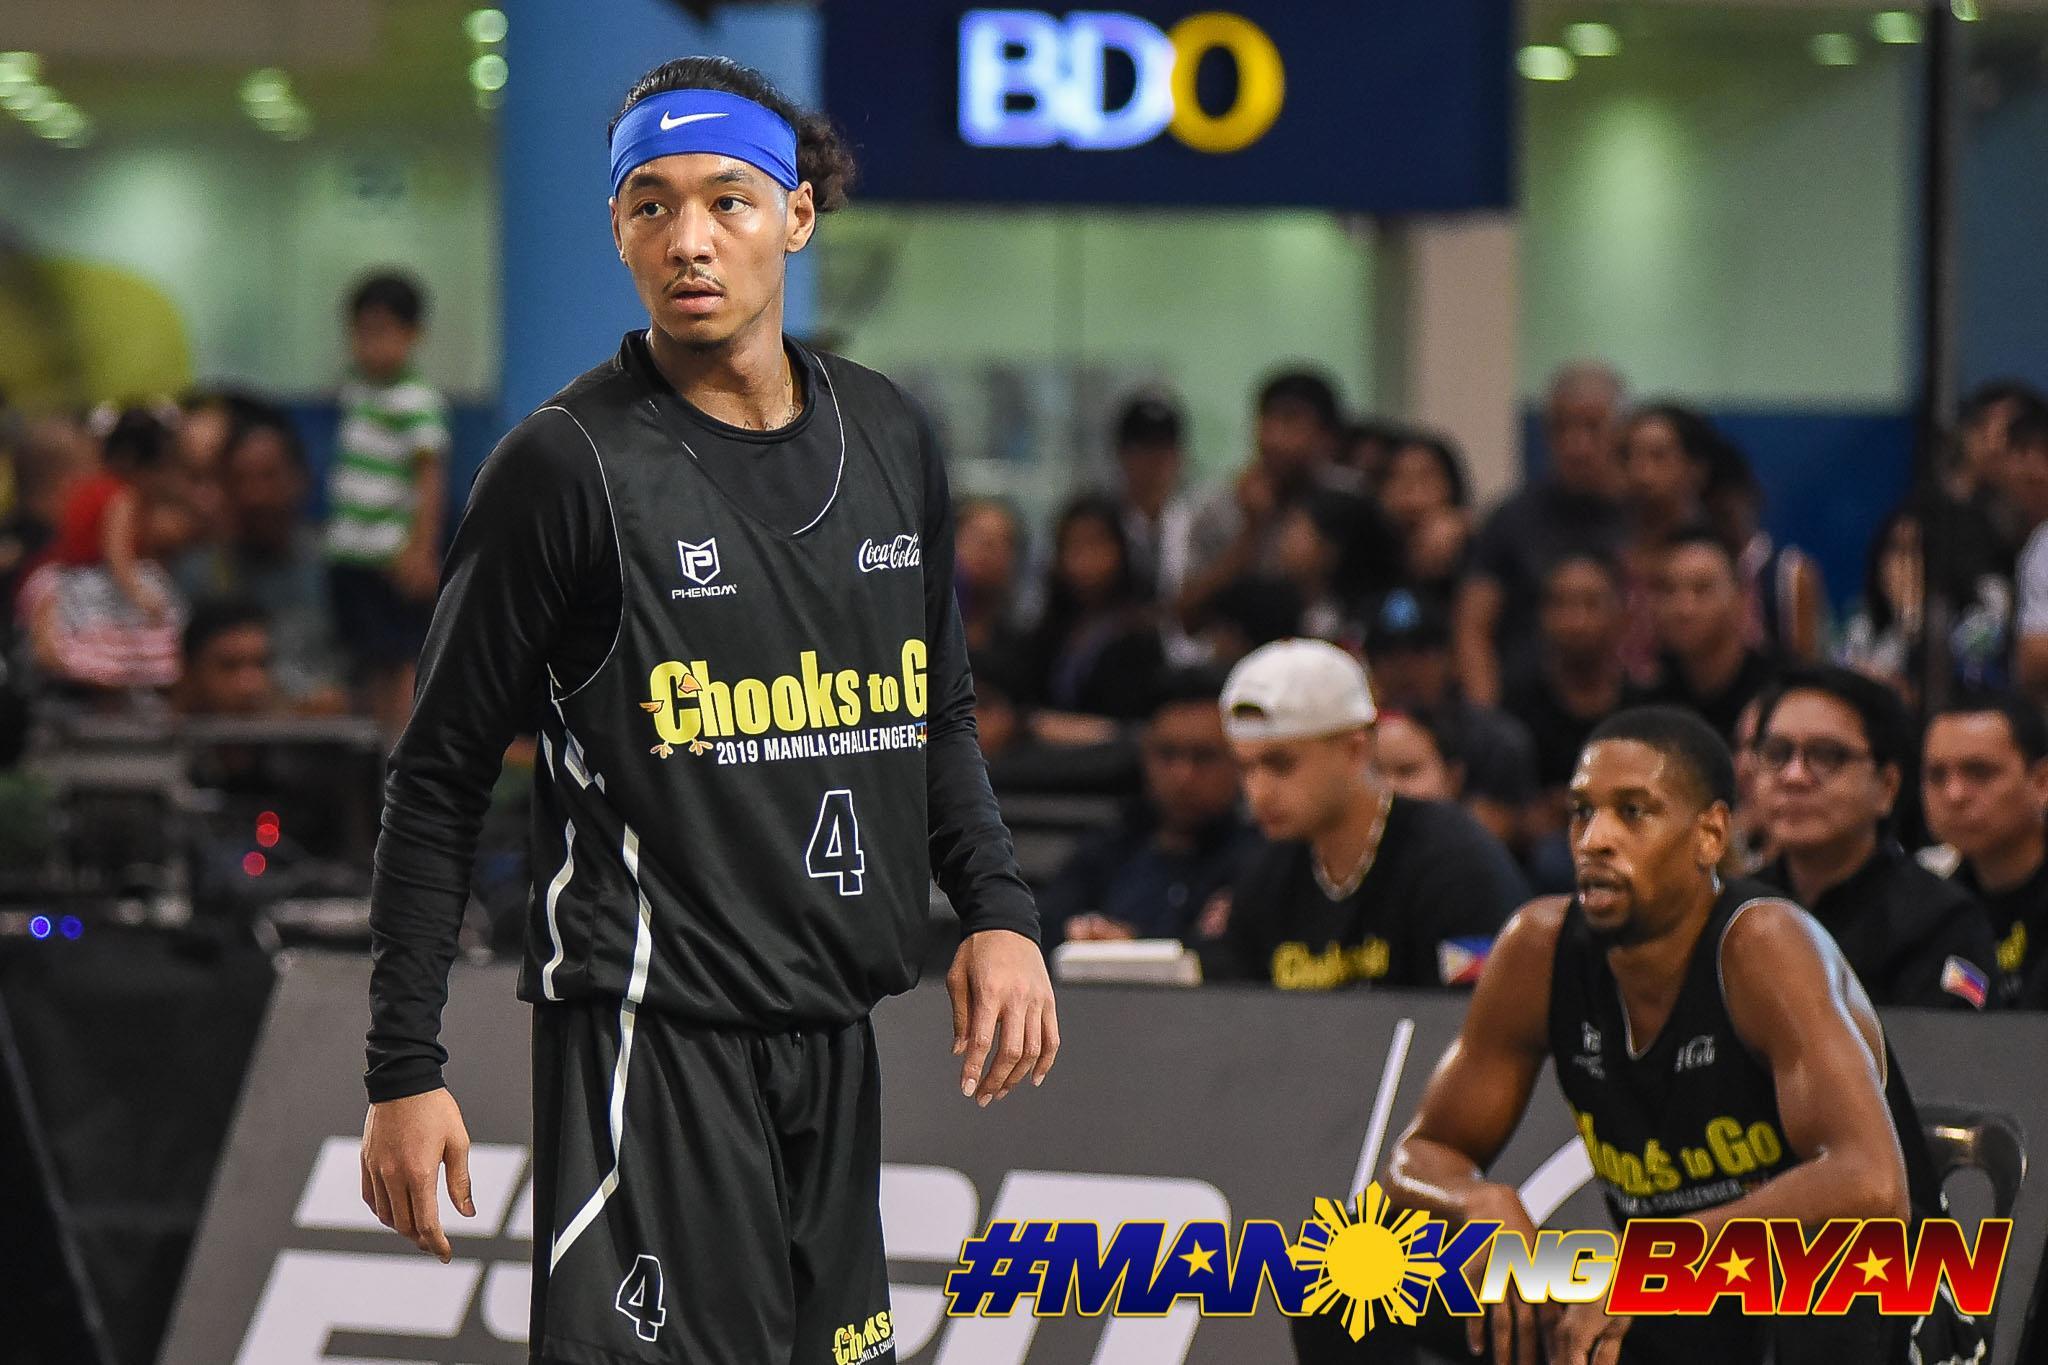 2019-Manila-Challenger-Isabela-Chooks-Franky-Johnson Chooks 3x3 MVP Franky Johnson declares for PBA Draft 3x3 Basketball Basketball Chooks-to-Go Pilipinas 3x3 News PBA  - philippine sports news